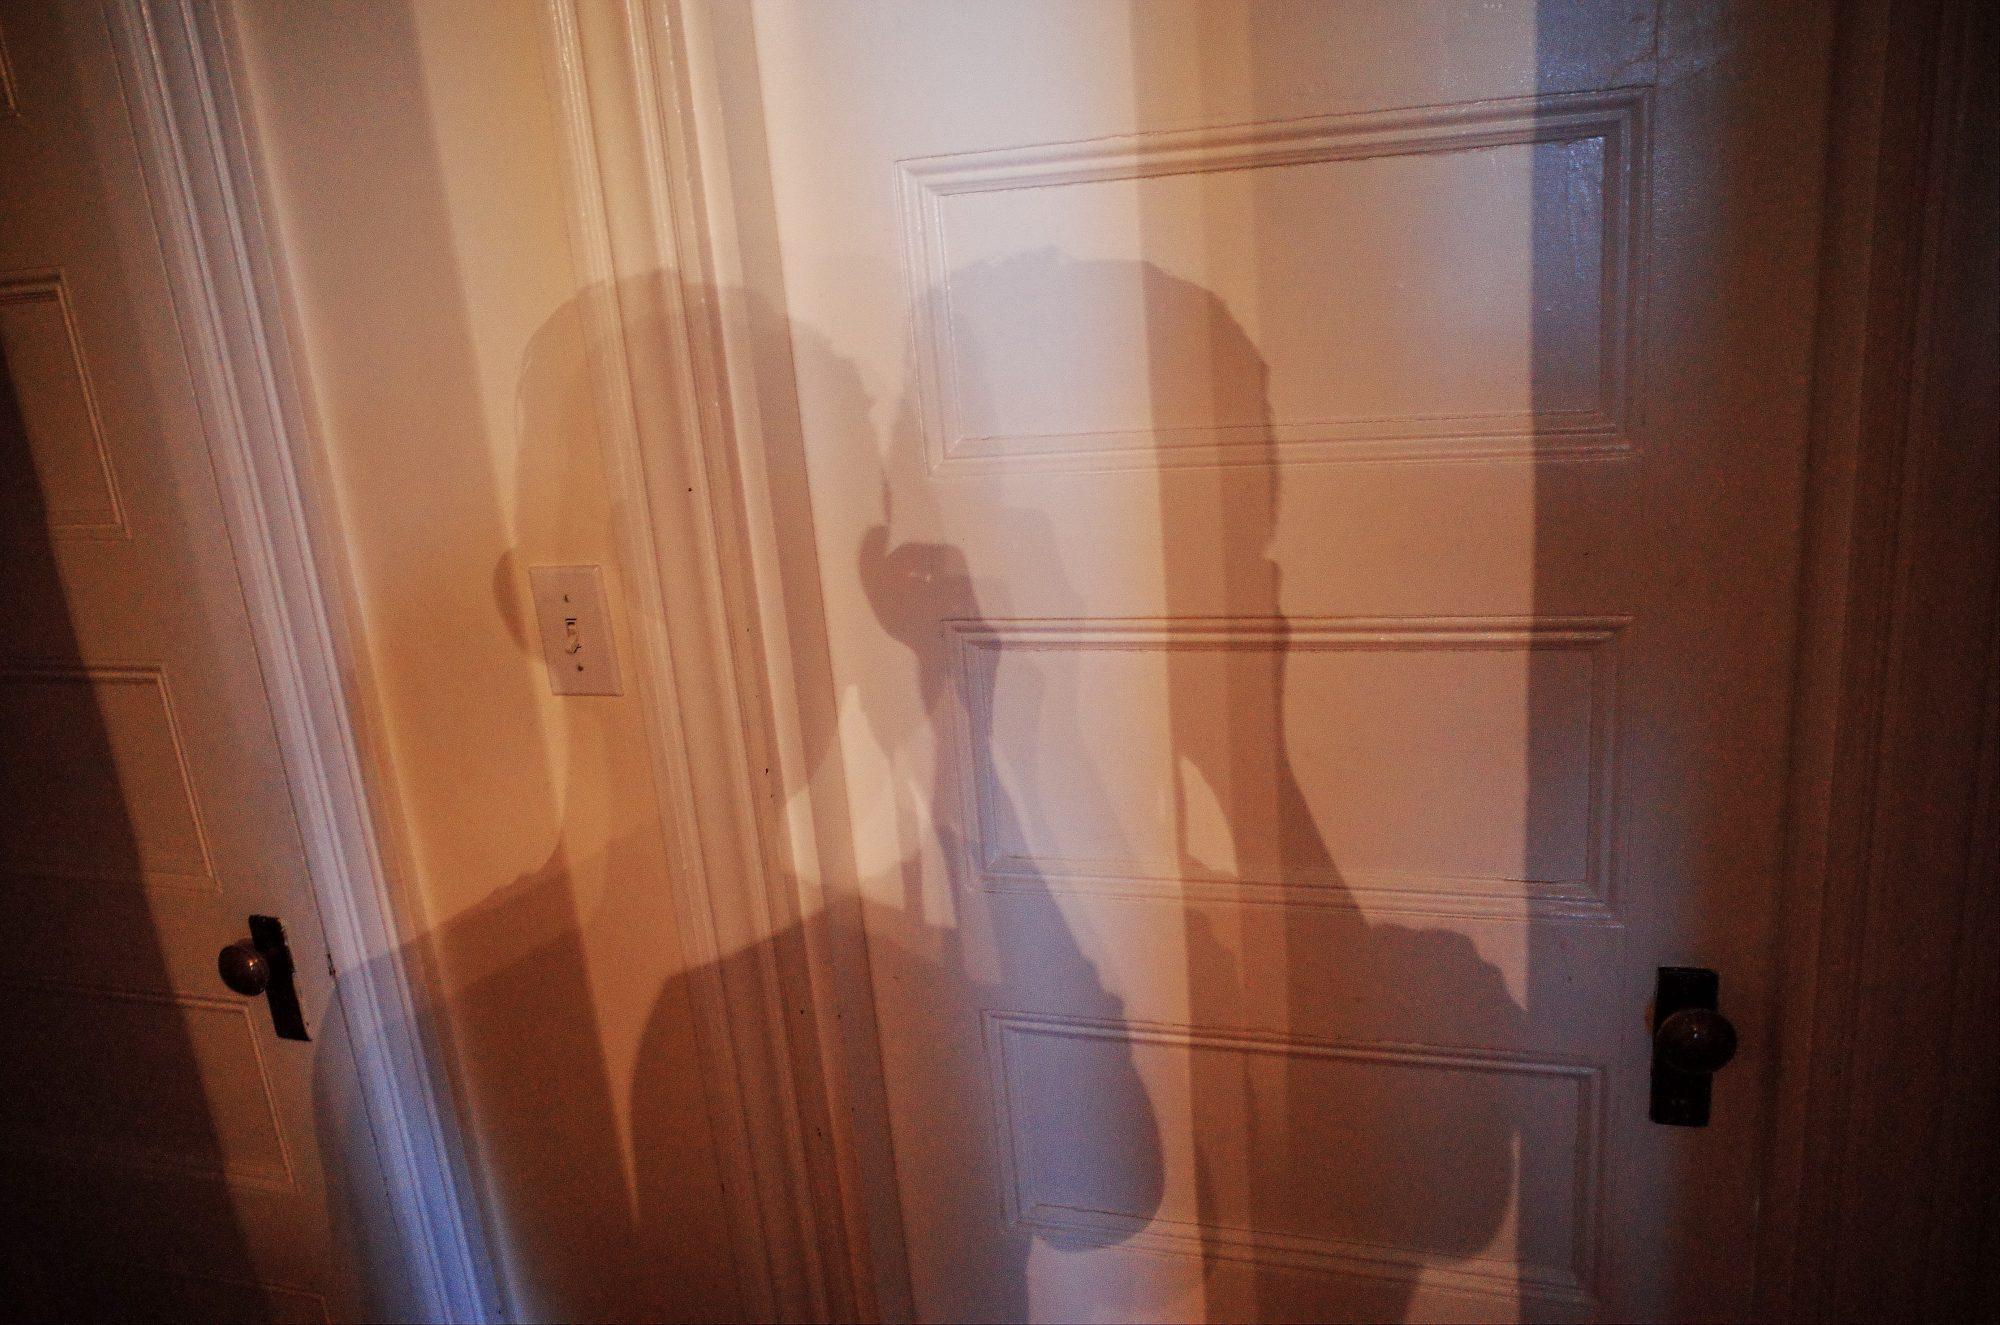 Shadow selfie. Boston, 2018